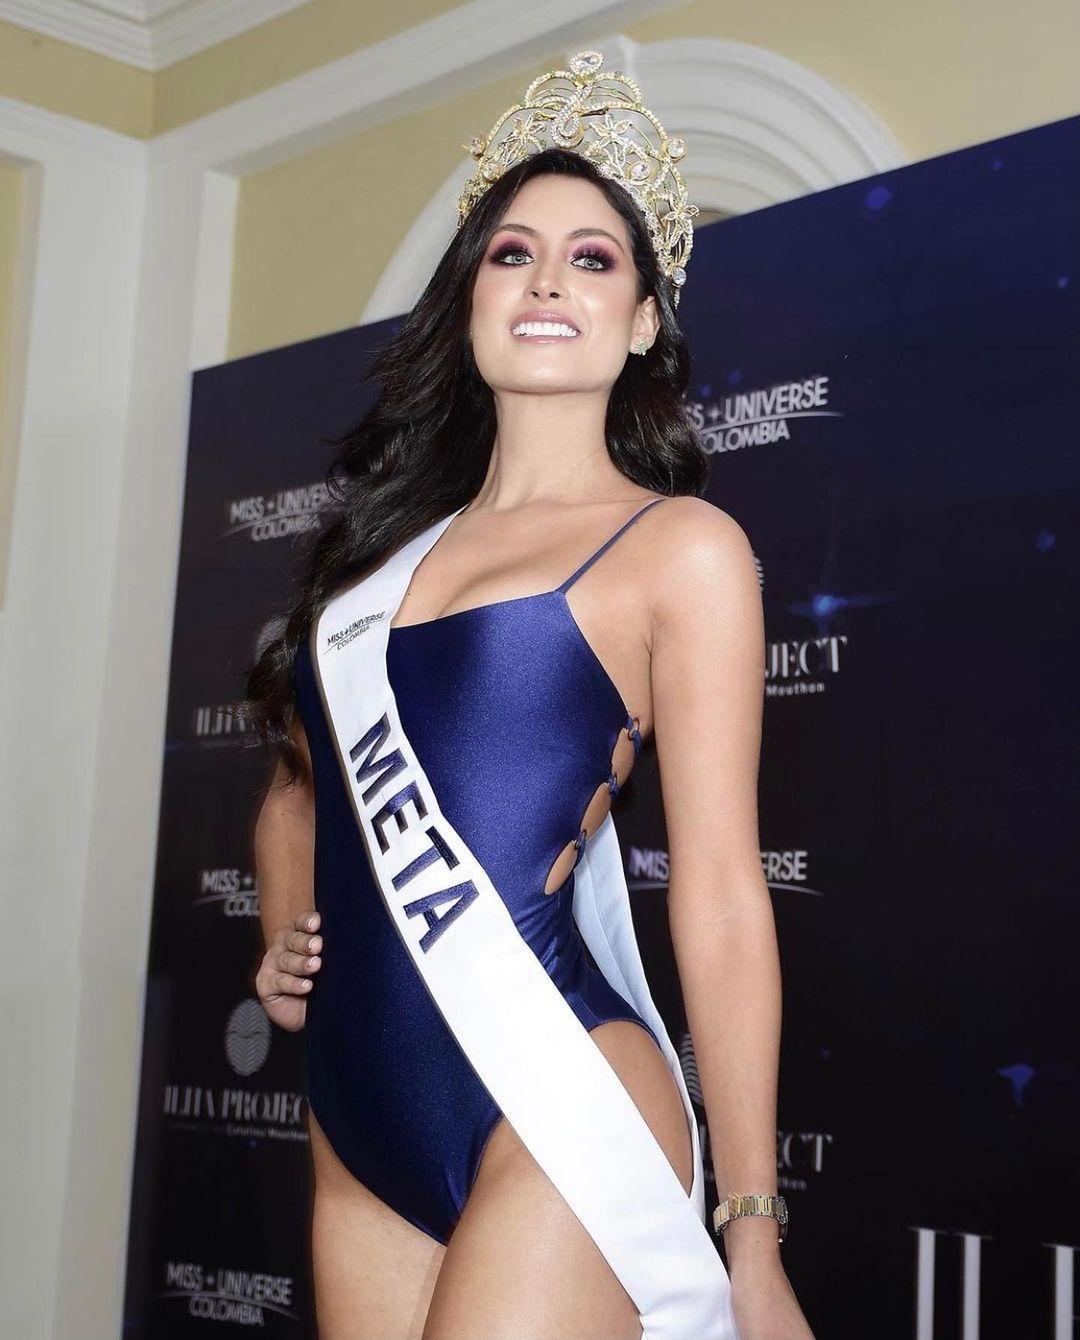 juliana franco, top 16 de miss colombia universo 2020/miss earth water 2017. - Página 22 Julifr30